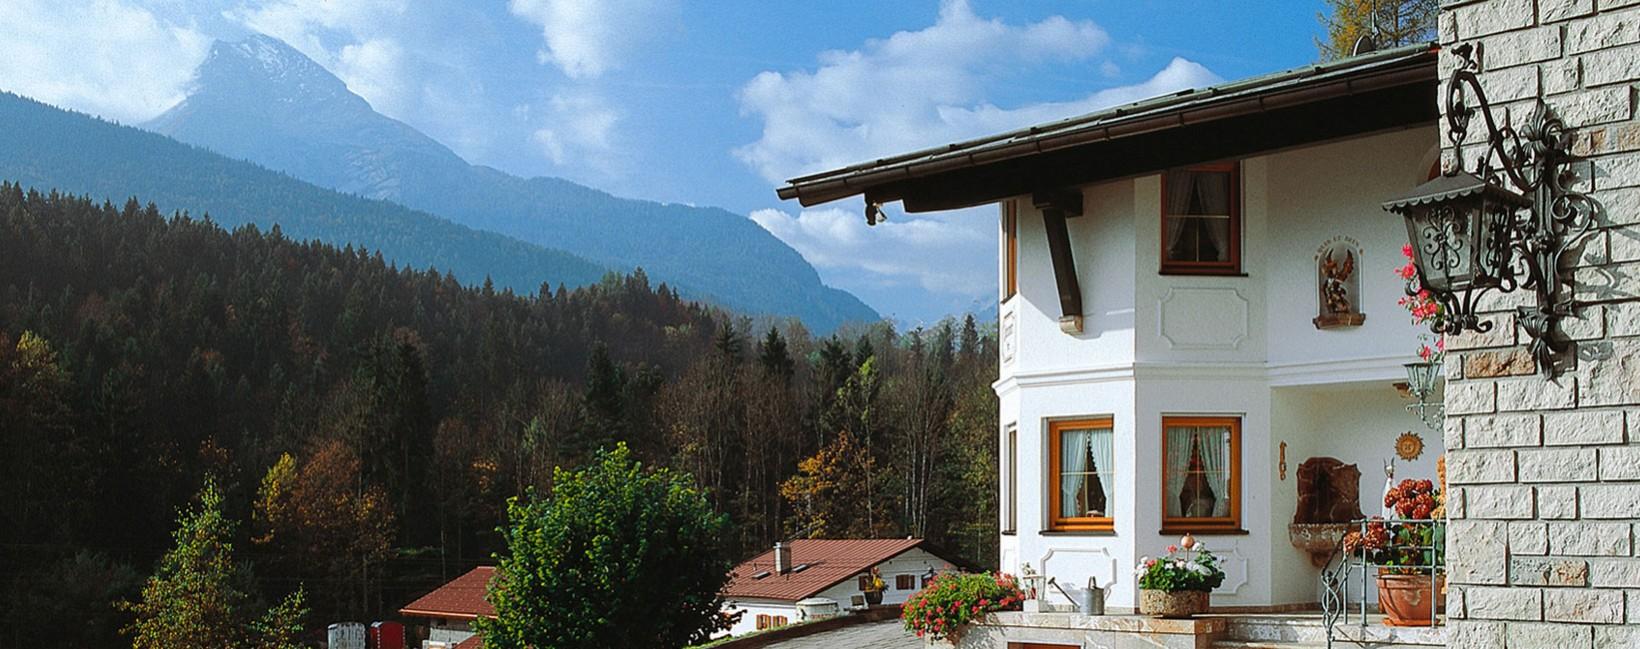 Pension Haus Michael Berchtesgaden im Sommer